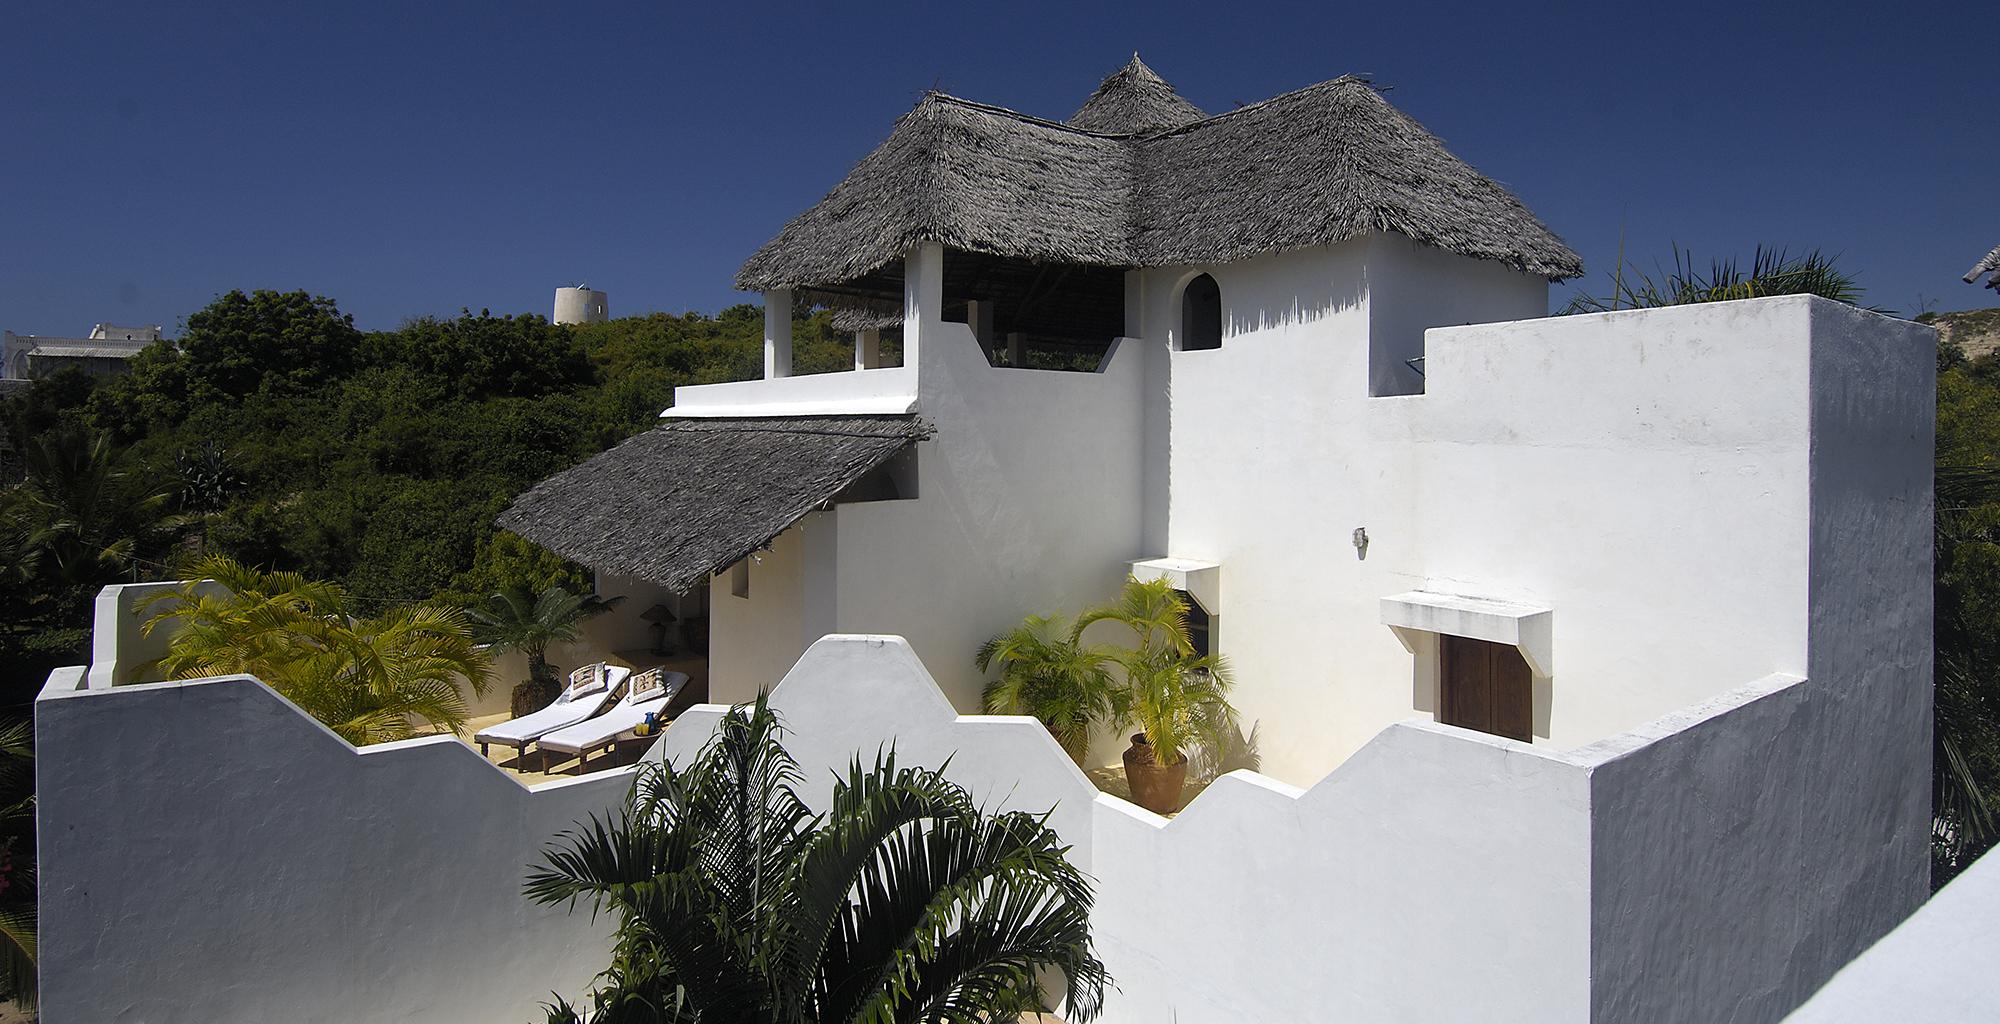 Kenya-Shela-And-Palm-House-Exterior